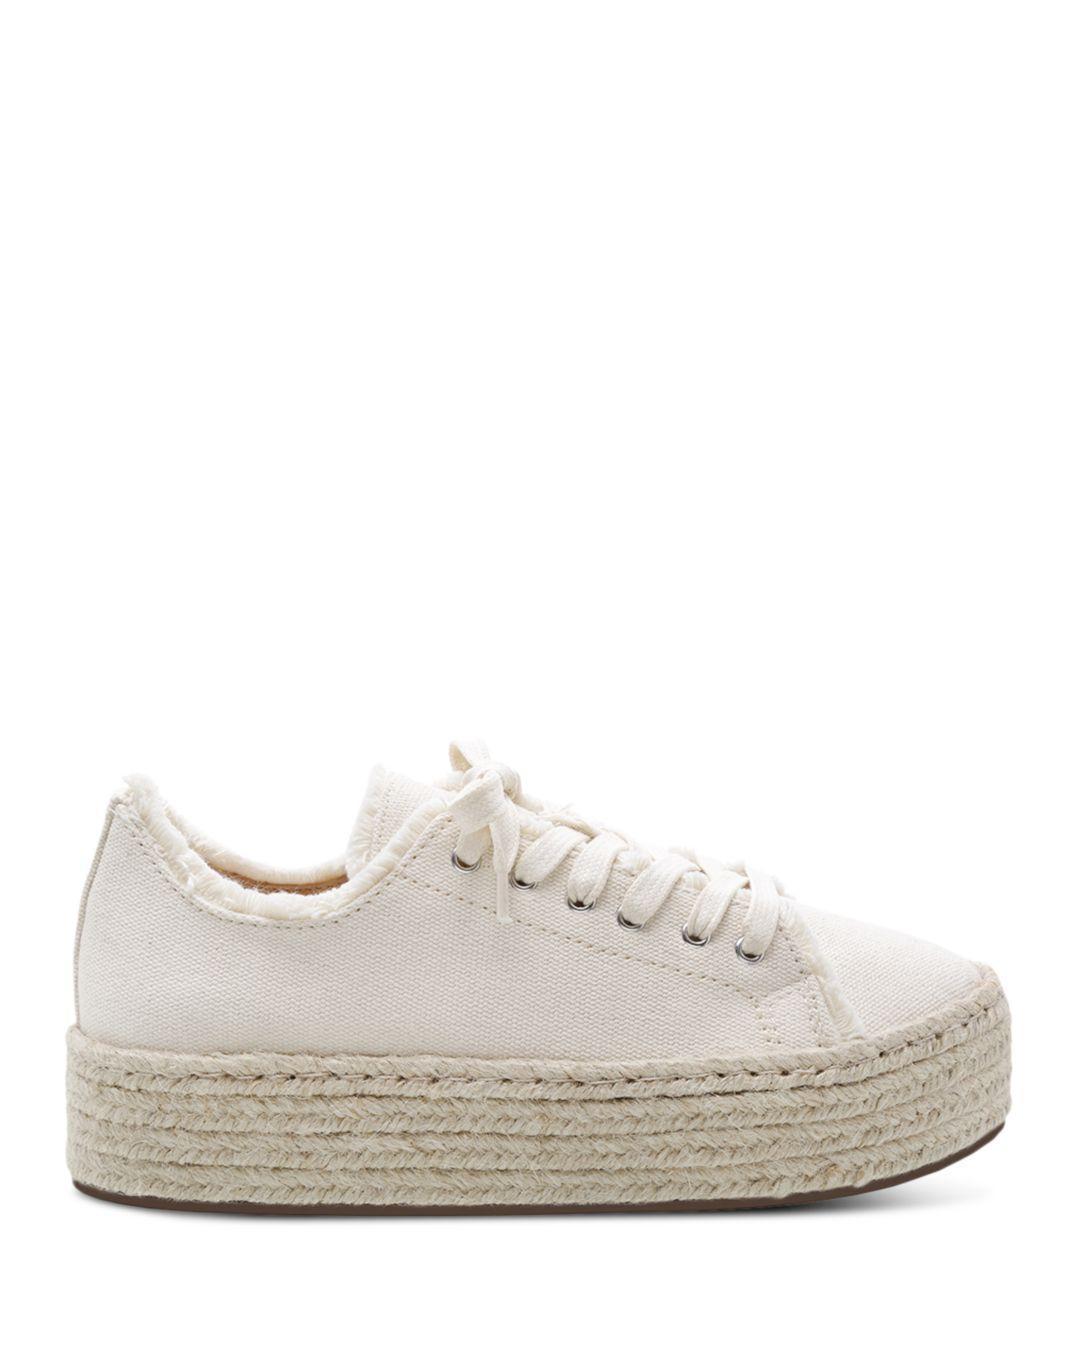 b415083eb5d7 Lyst - Schutz Women s Luana Espadrille Lace-up Sneakers in White